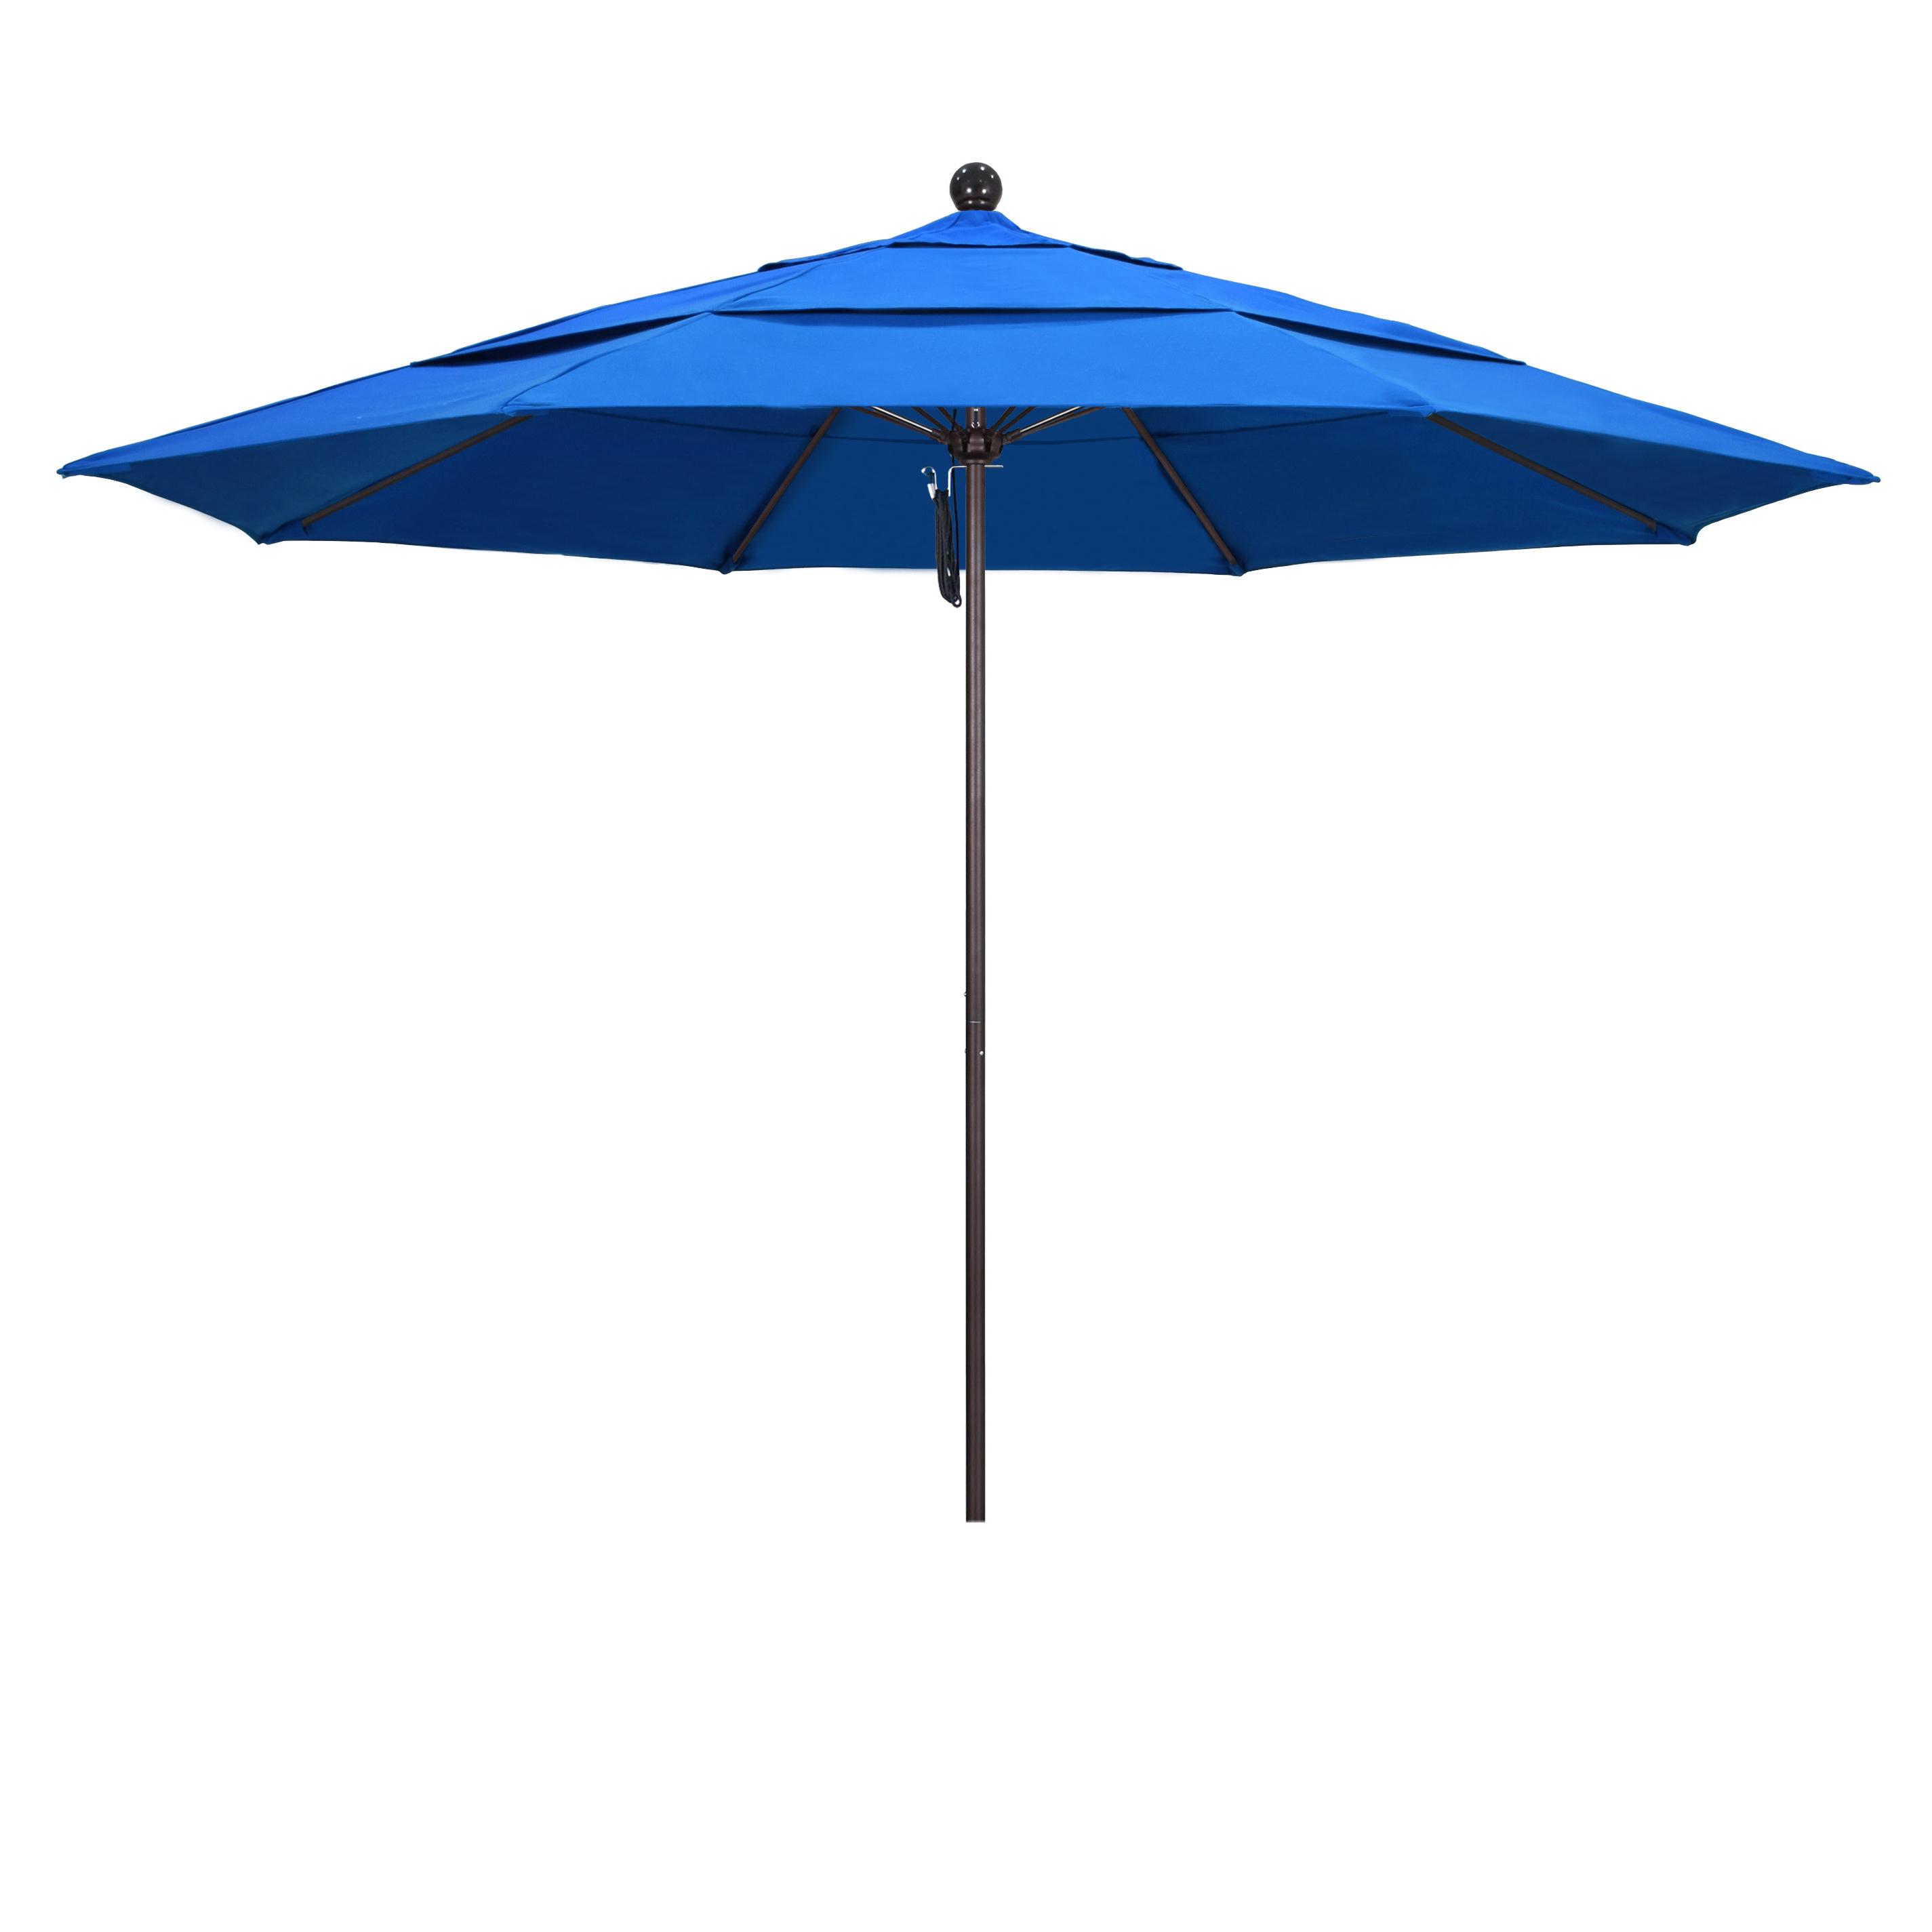 Caravelle Market Umbrellas Throughout Popular Benson 11' Market Umbrella (View 3 of 20)